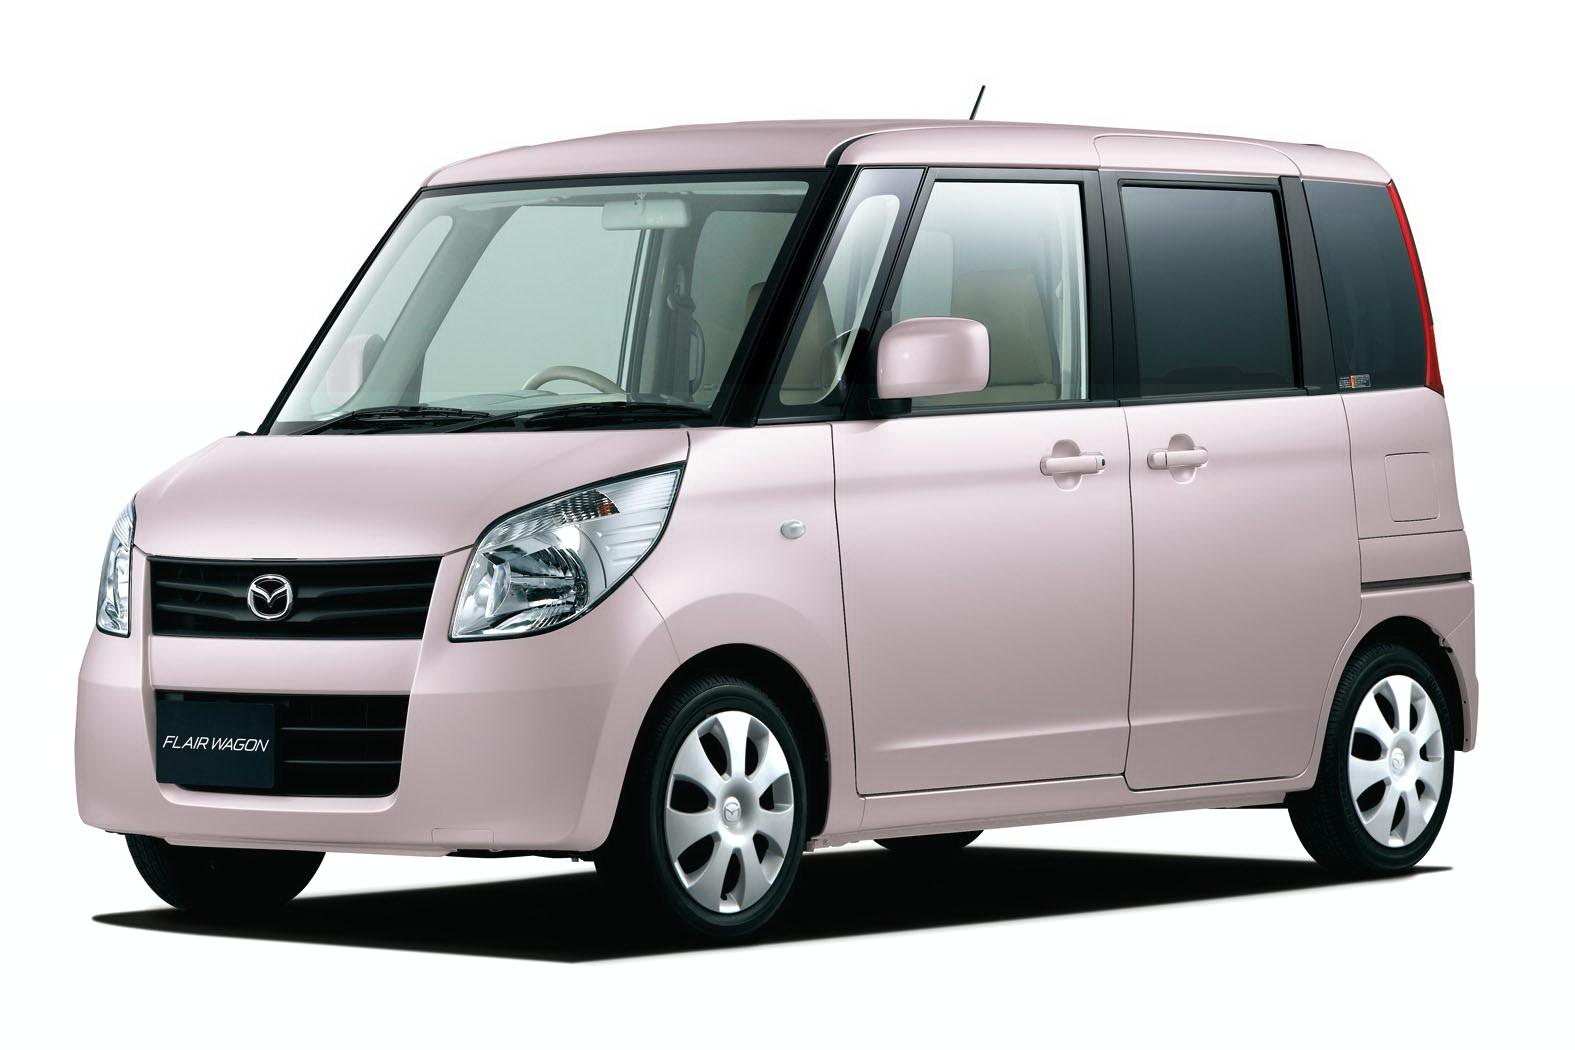 http://1.bp.blogspot.com/-8gJoMf6iCOU/T-1yt6qqBVI/AAAAAAAAg8k/Vb5S109YWfk/s1600/Mazda-FlairWagon-1.jpg